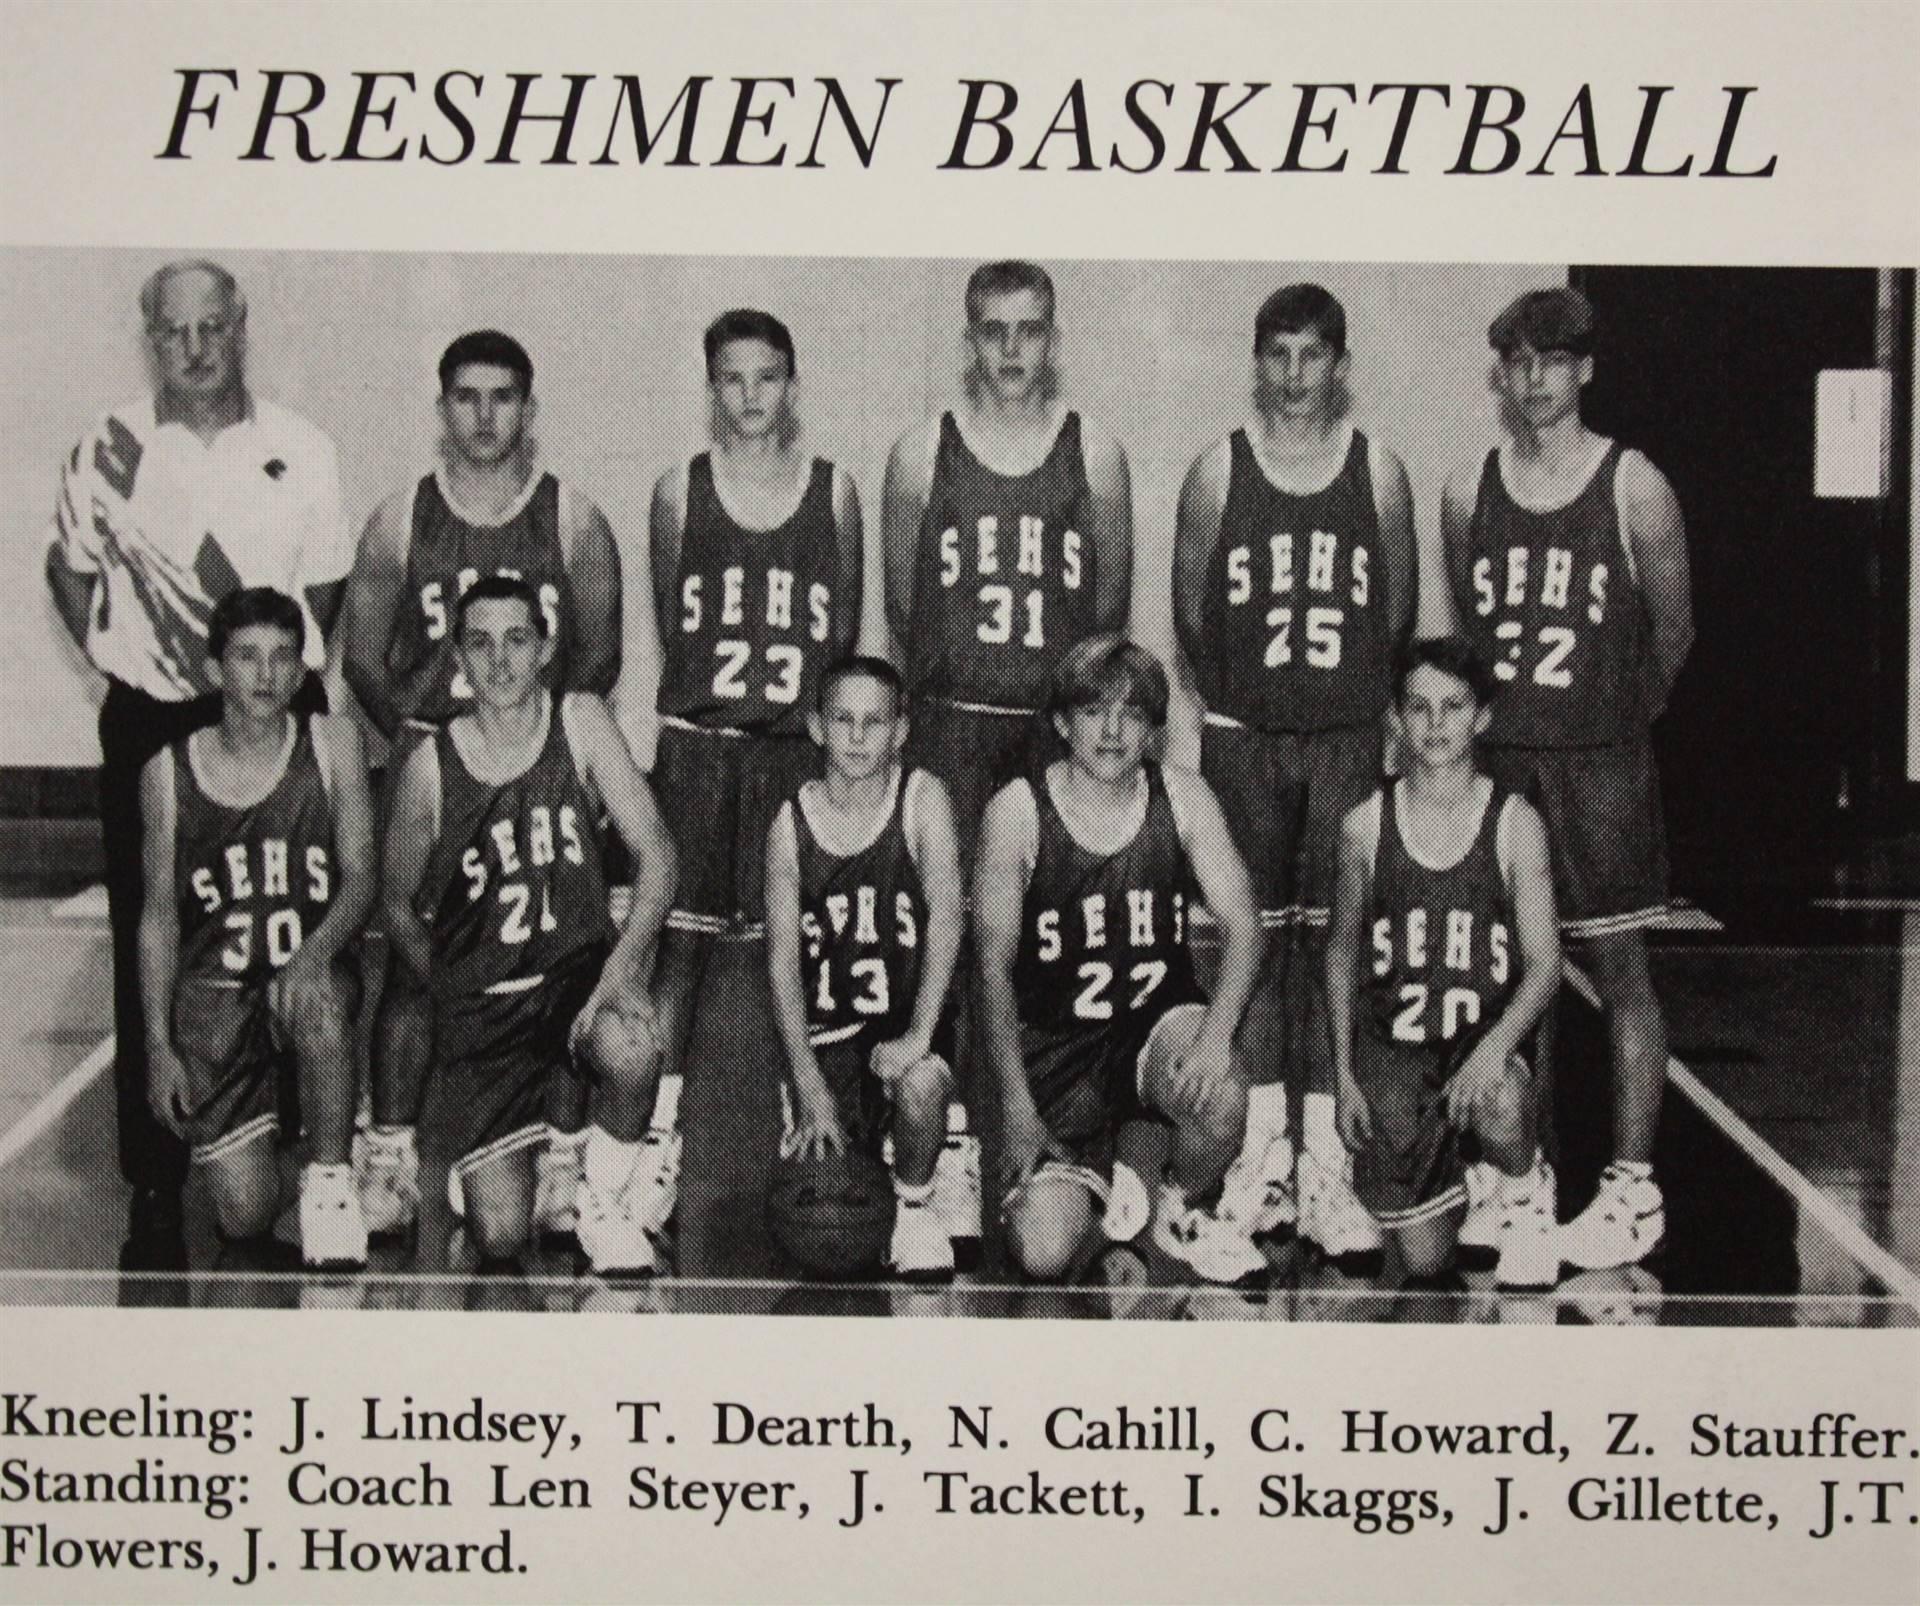 1995 Freshman Basketball